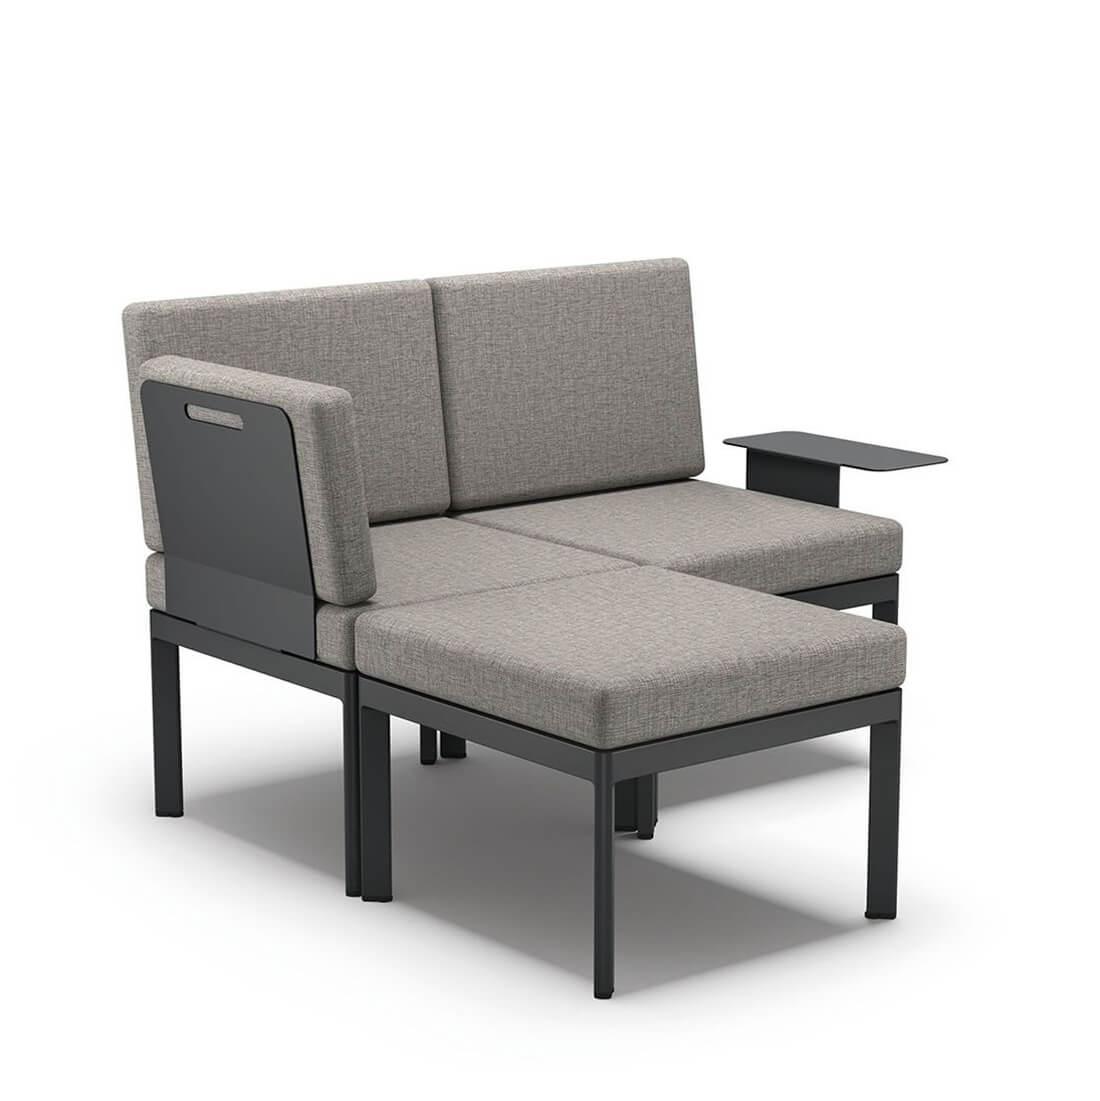 Градински ъглов диван с лежанка и масичка Lugo